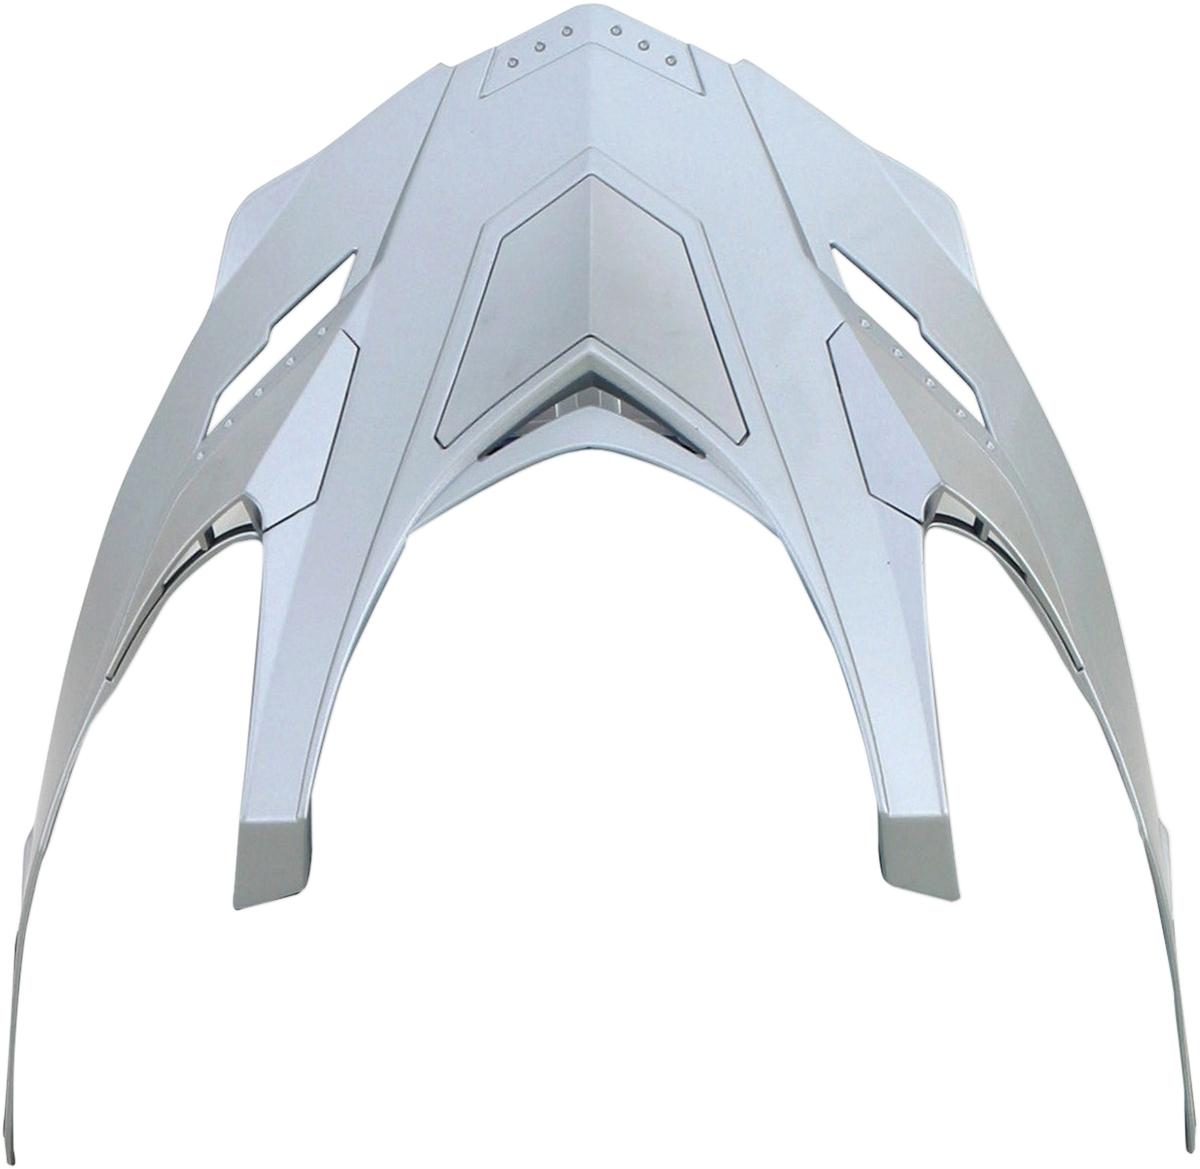 AFX Peak for FX-55 Helmet Silver   0132-0786